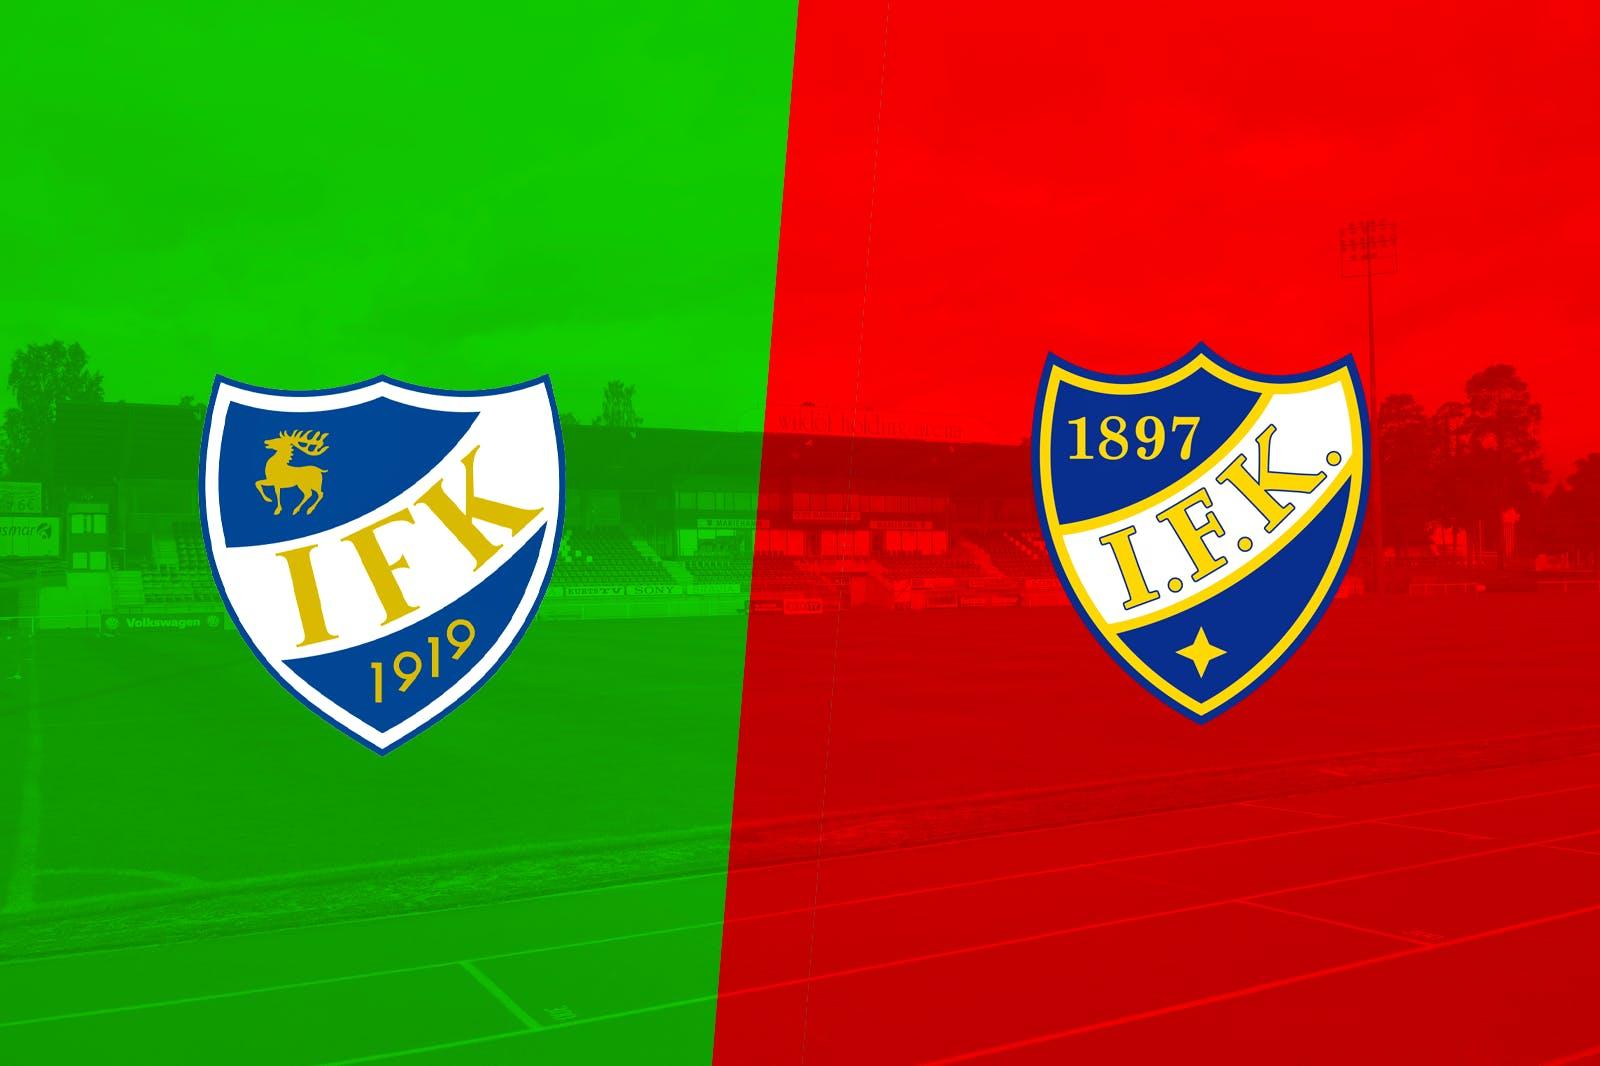 Inför matchen: Europlayoff inleds imorgon i Mariehamn